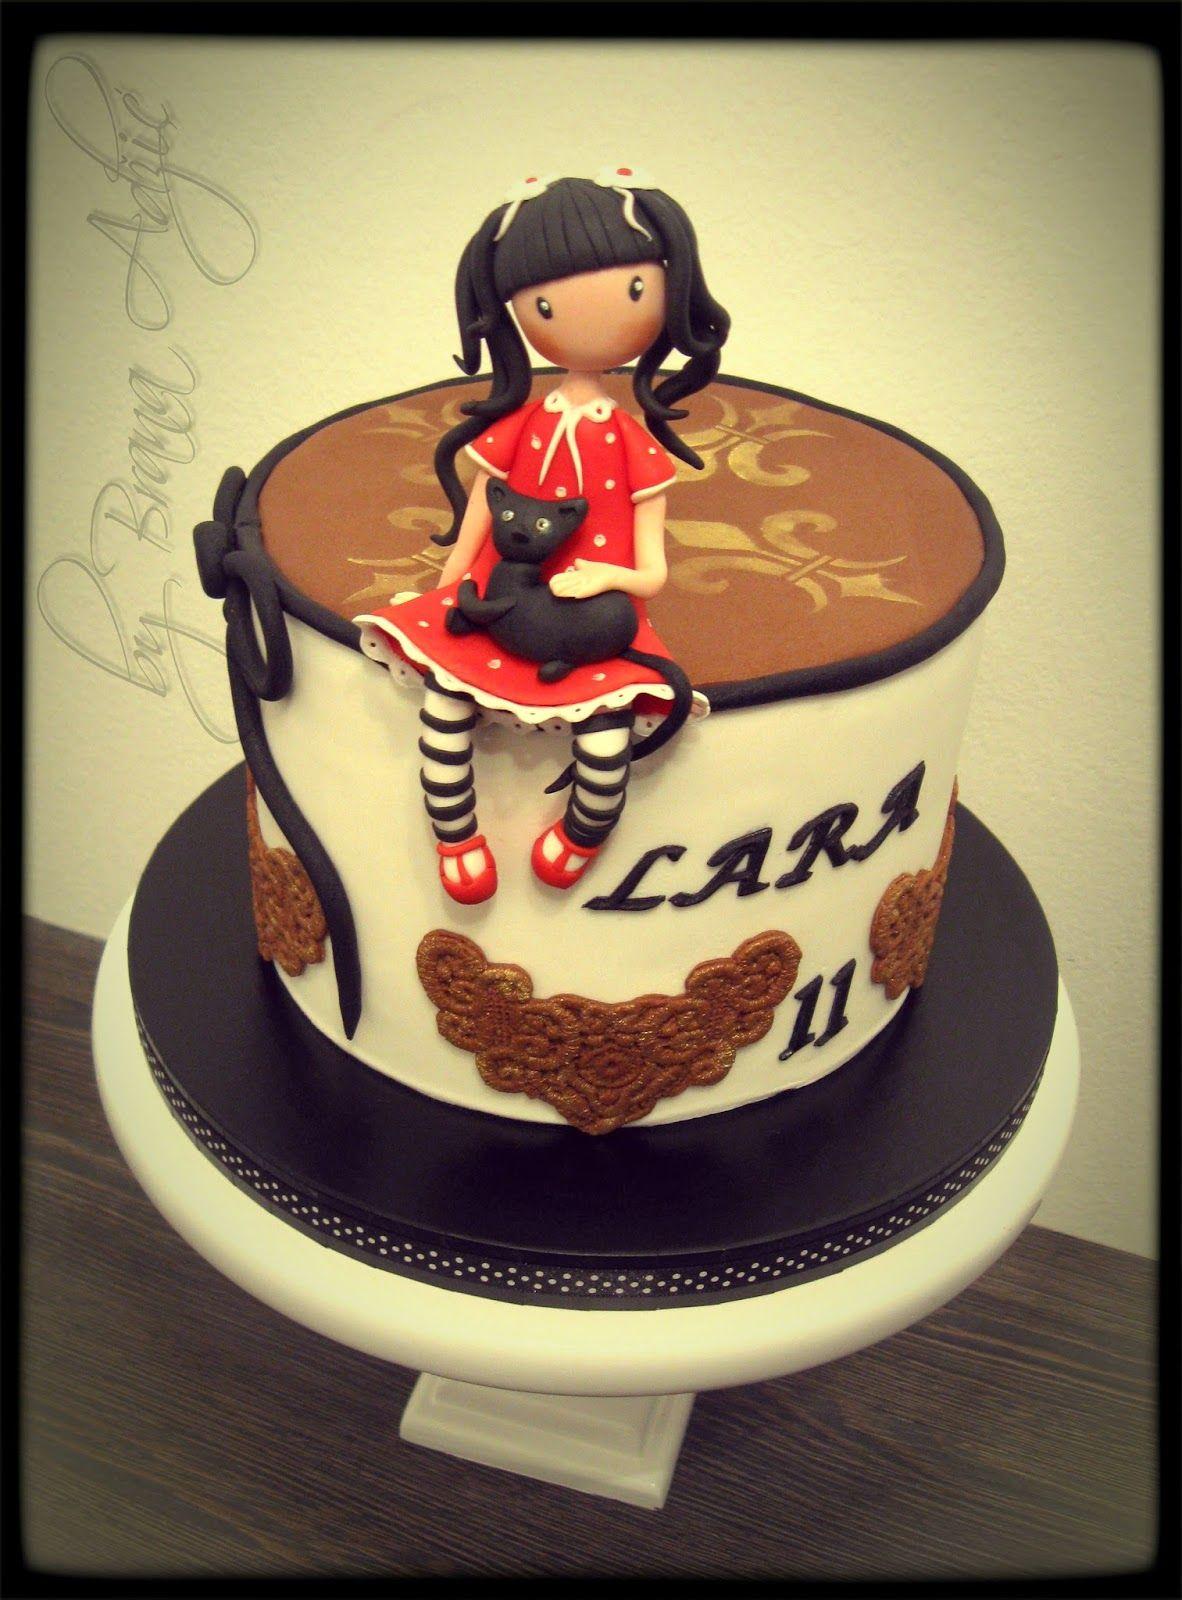 Birthday Cakes For Girls Za ~ Arobni u itak torte by brana ad i novi sad ro endanske za devoj ice birthday cakes